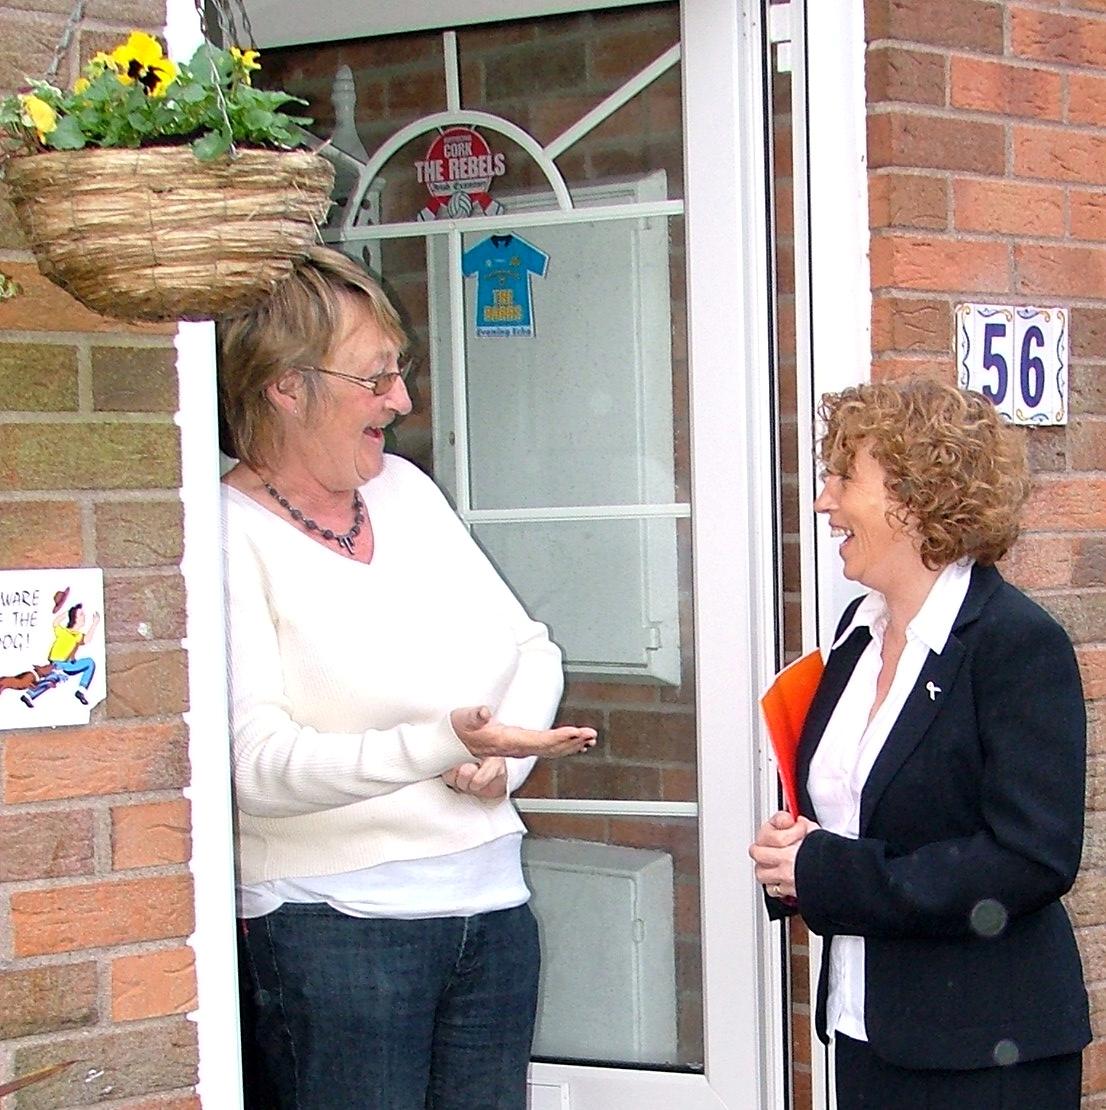 Door-to-door canvassing campaigns can sway voter decisions